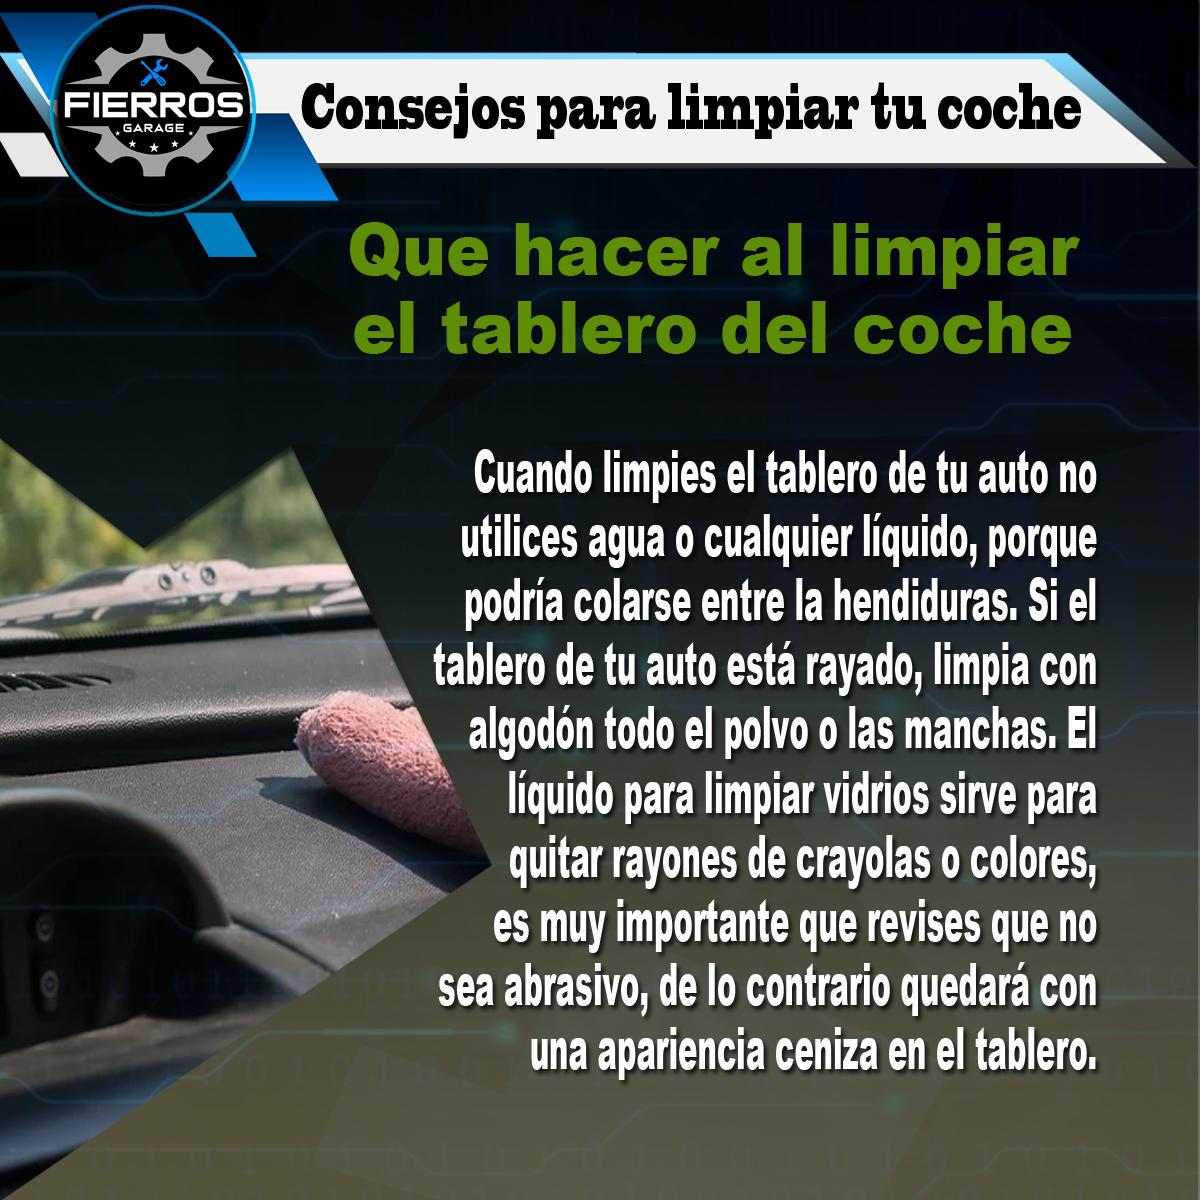 #FierrosGarage #Consejos para limpiar tu coche pic.twitter.com/ybTrwpWLvD